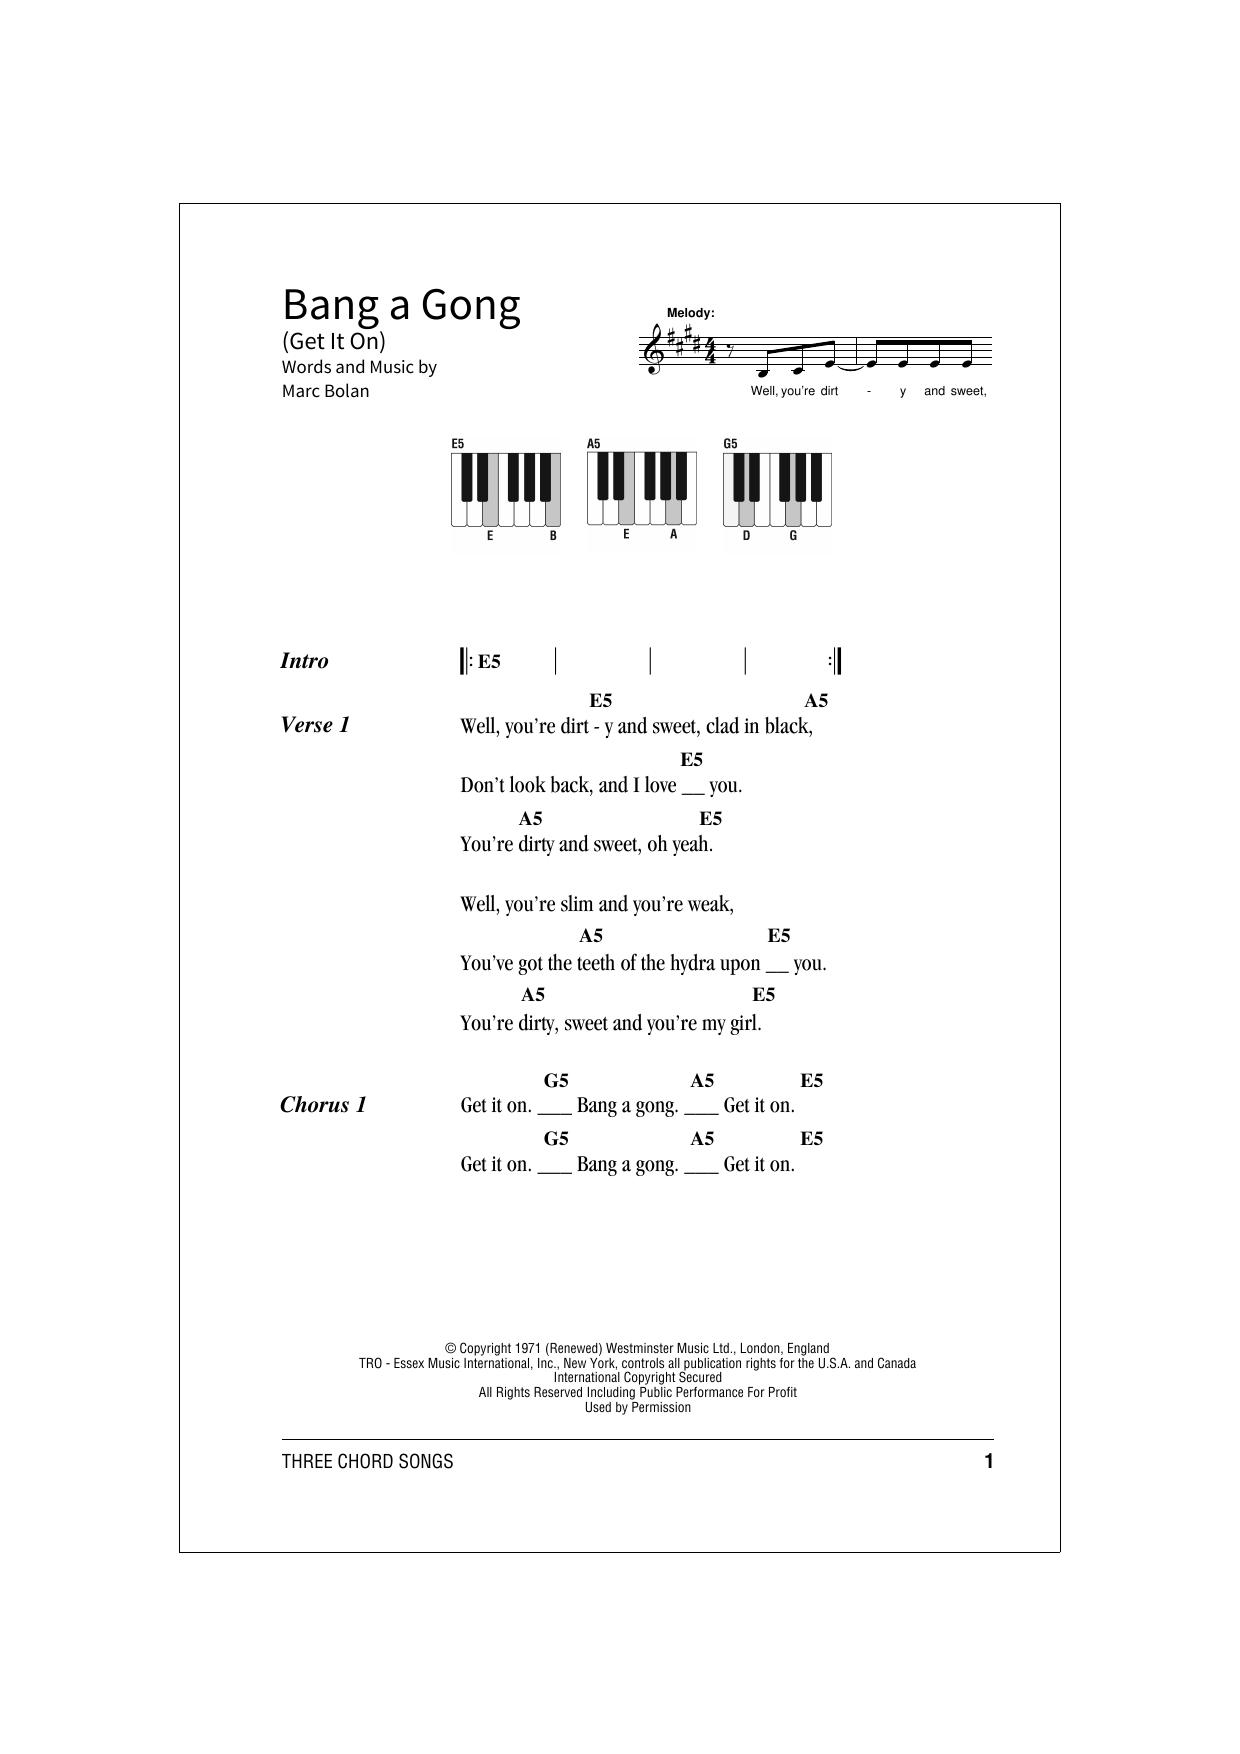 Bang A Gong (Get It On) Sheet Music